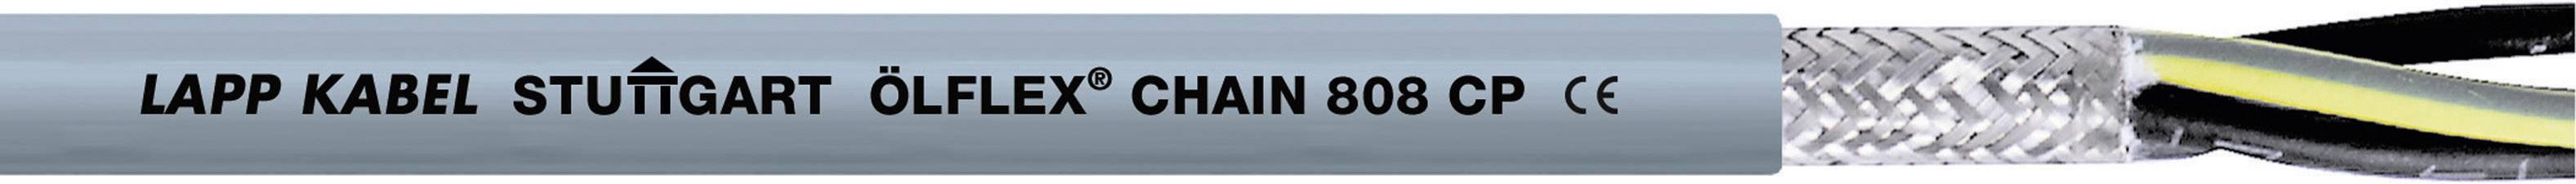 Žíla kabelu LappKabel ÖLFLEX CHAIN 808 CP 5G1,5 (1027778), 5x 1,5 mm², polyurethan, Ø 9,1 mm, stíněný, 1 m, še